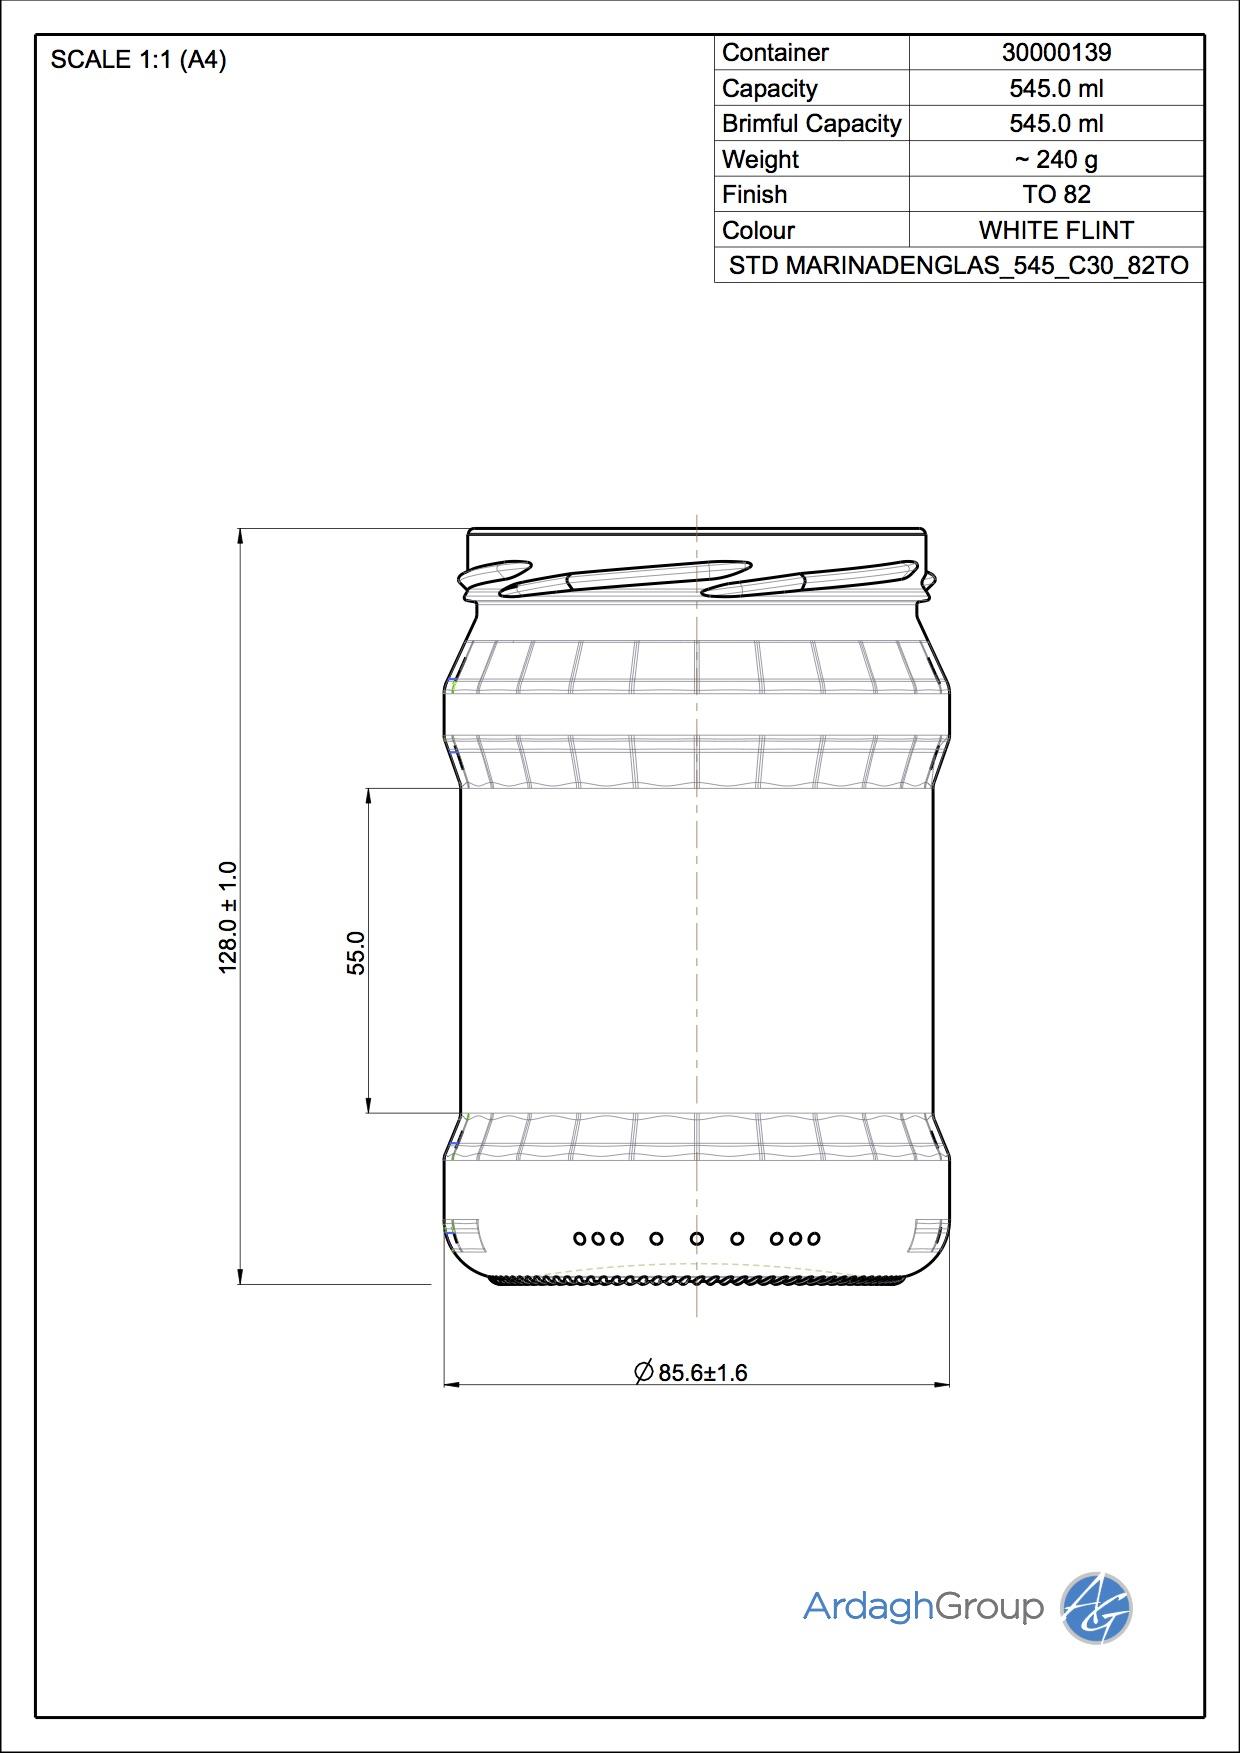 Marinandenglas 545 C30 82TO